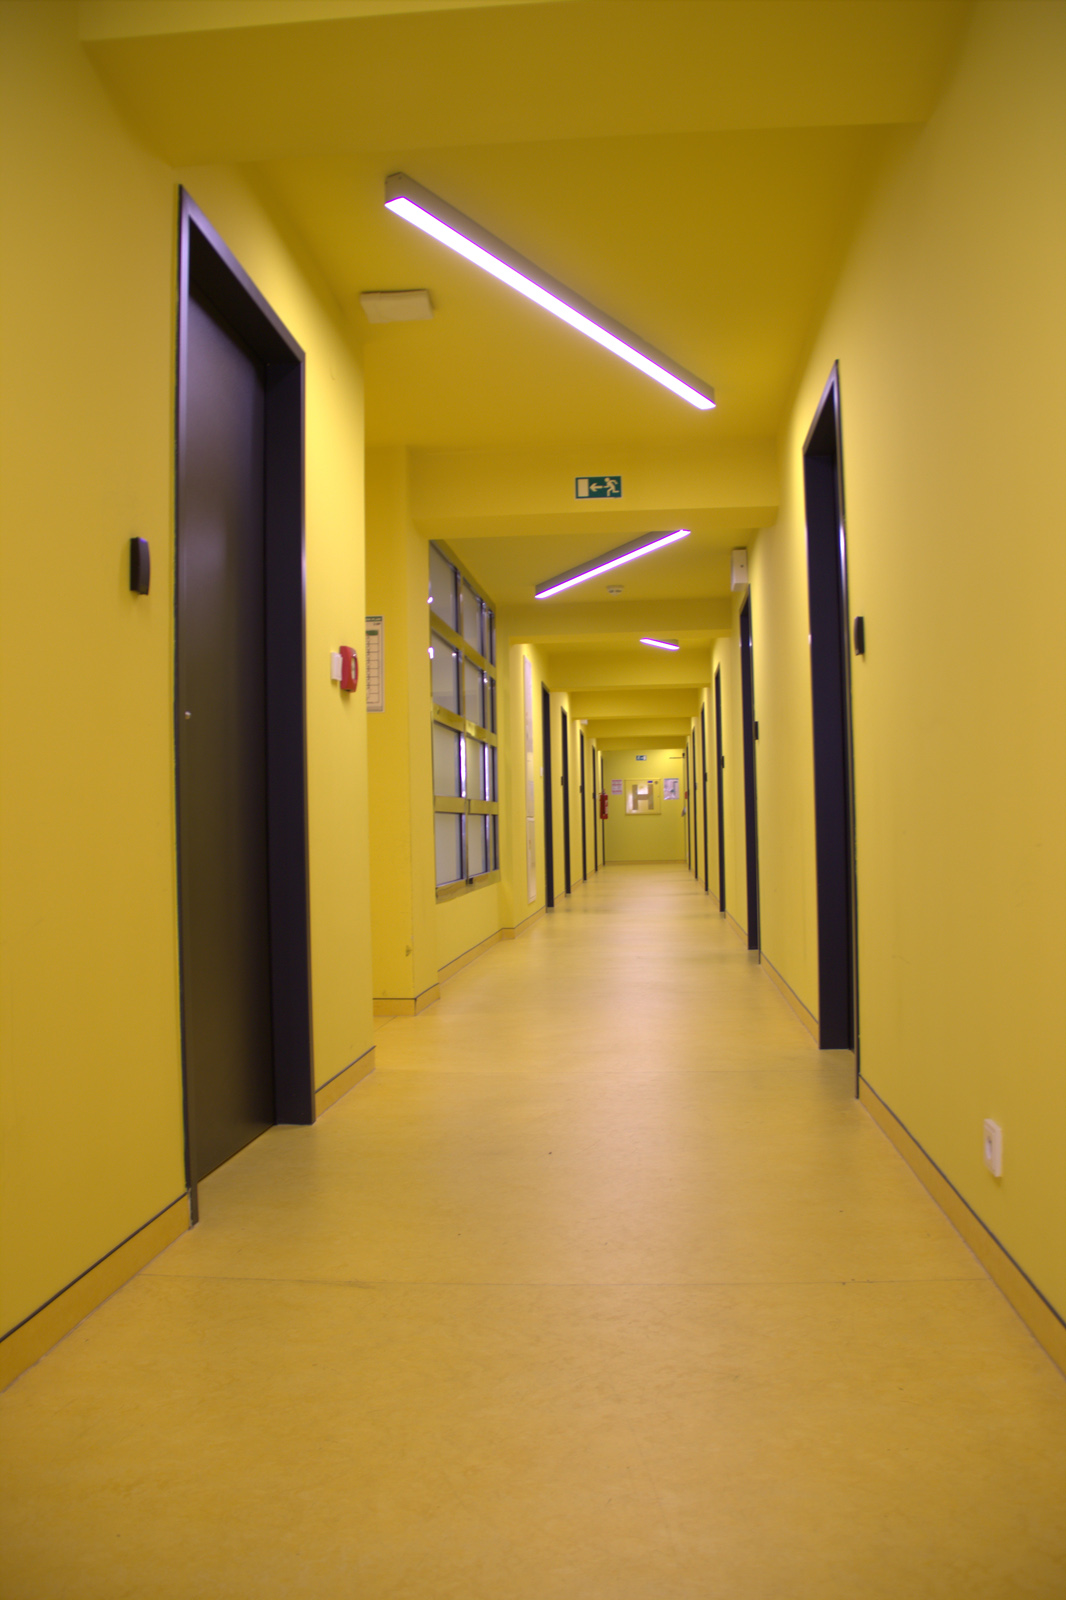 Coridor 1st Floor